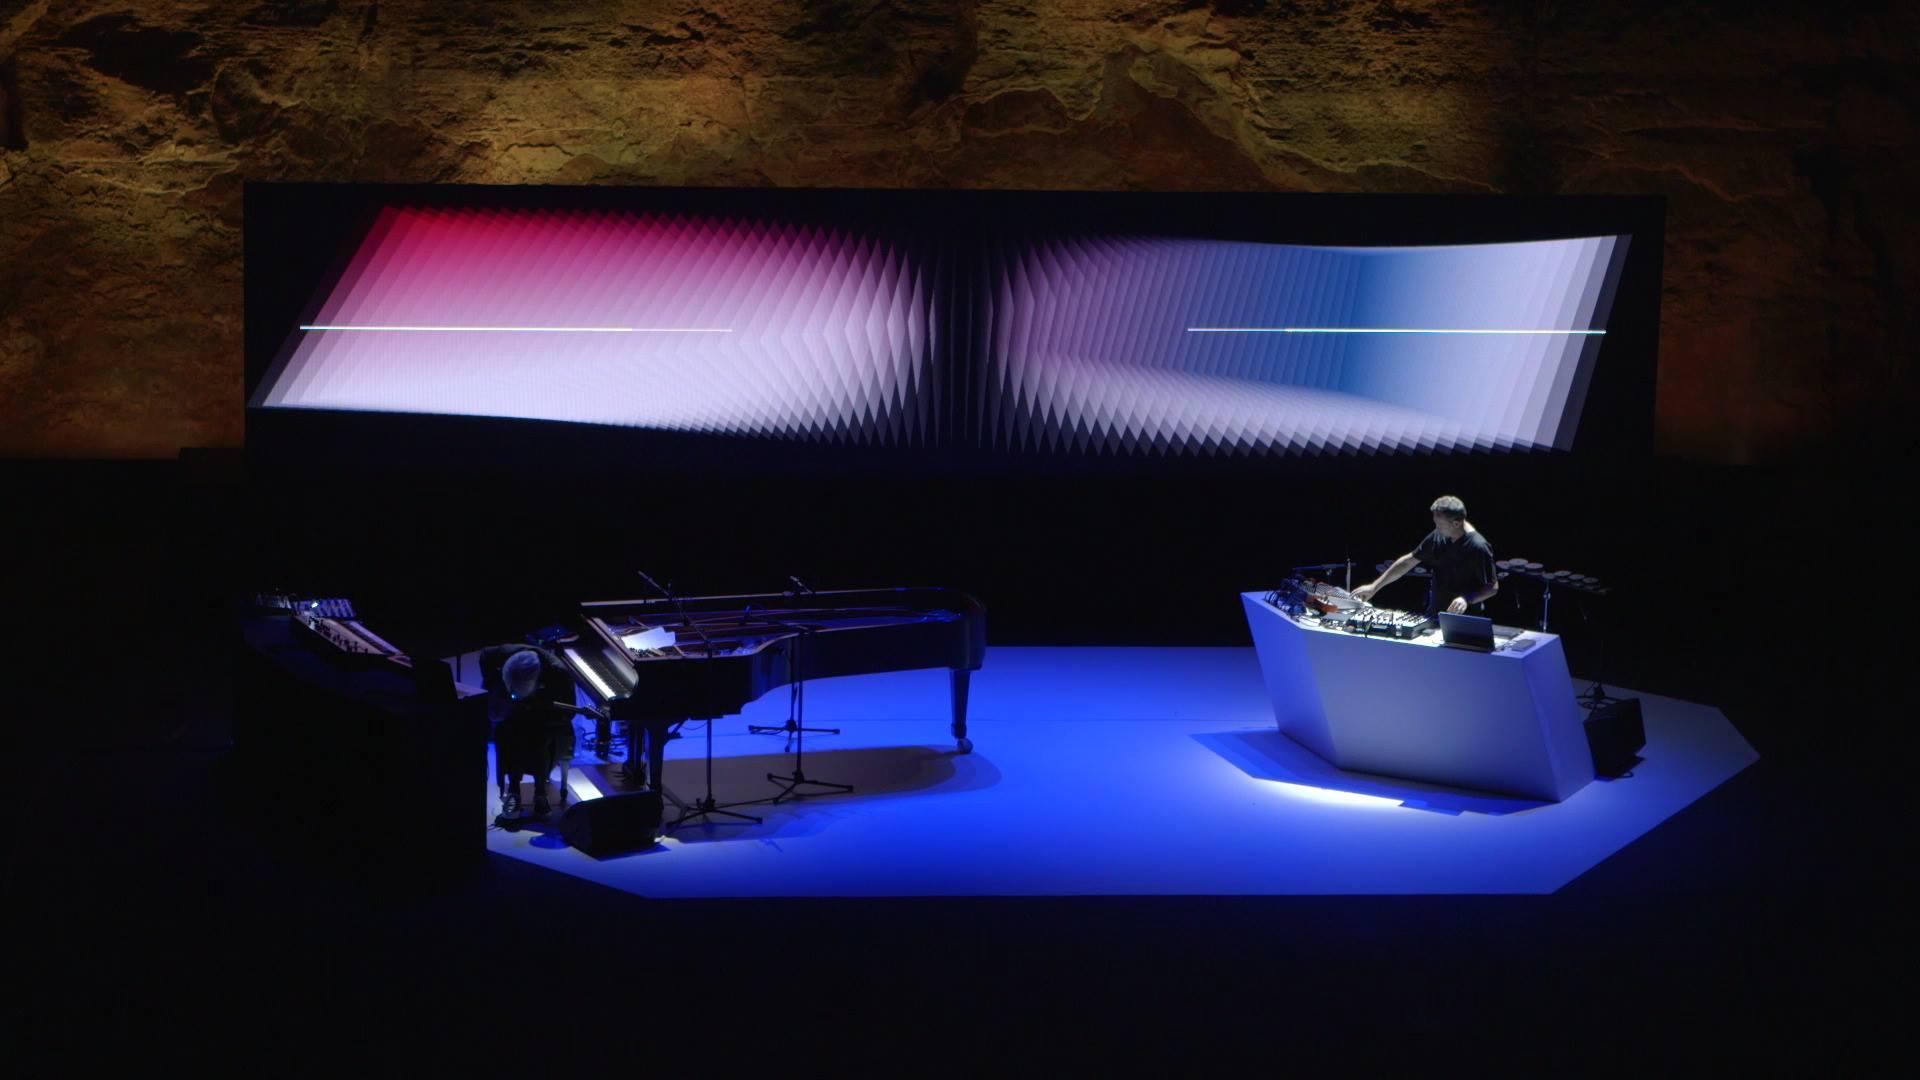 Alva Noto & Ryuichi Sakamoto - TWO Live at Teatre Grec, Sonar 2018